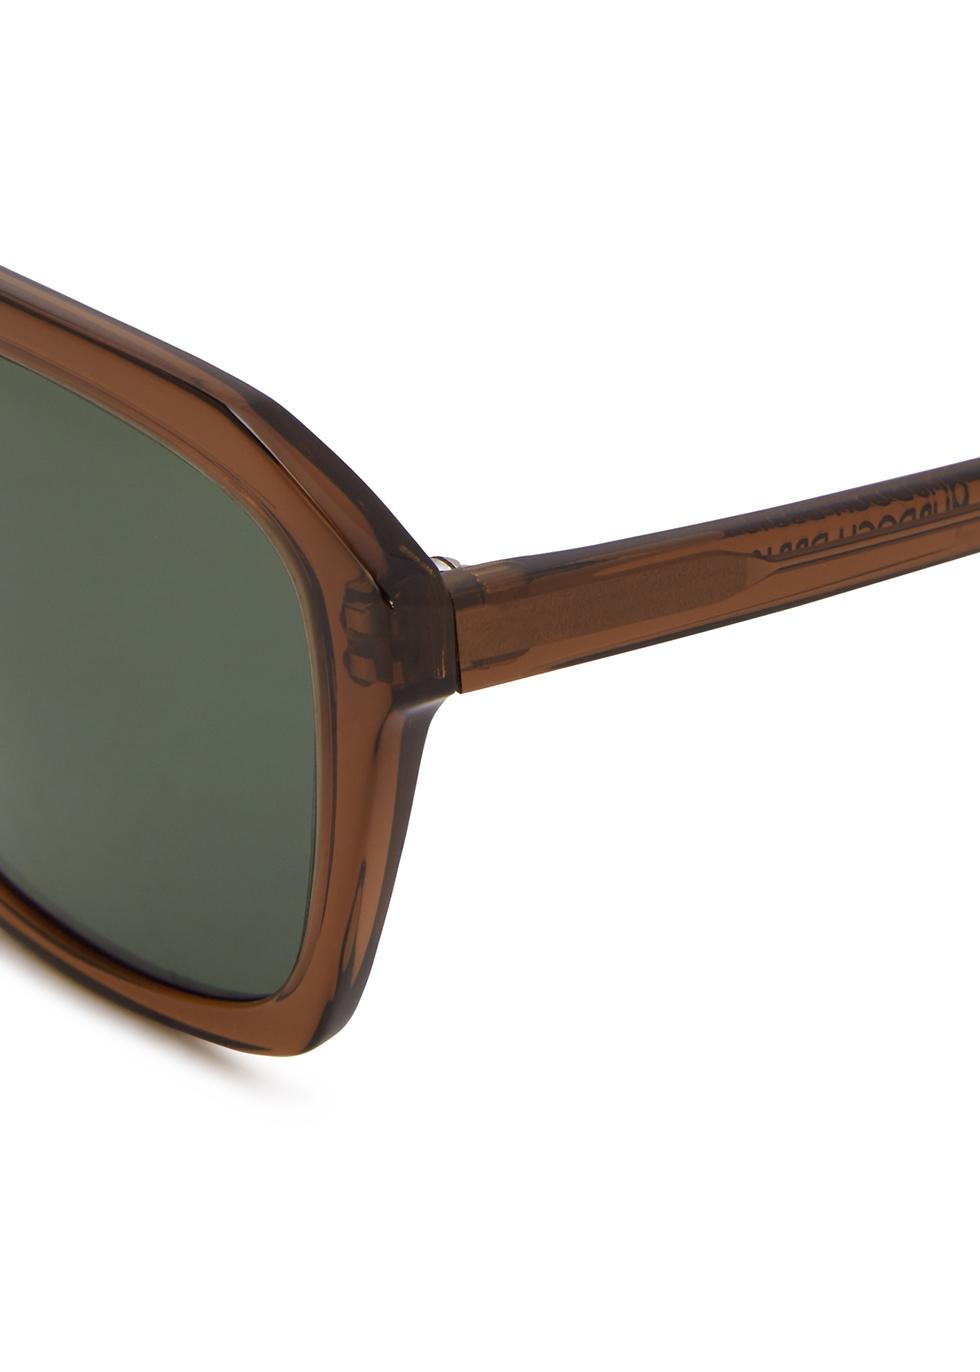 Murdoch brown D-frame sunglasses - Finlay & Co